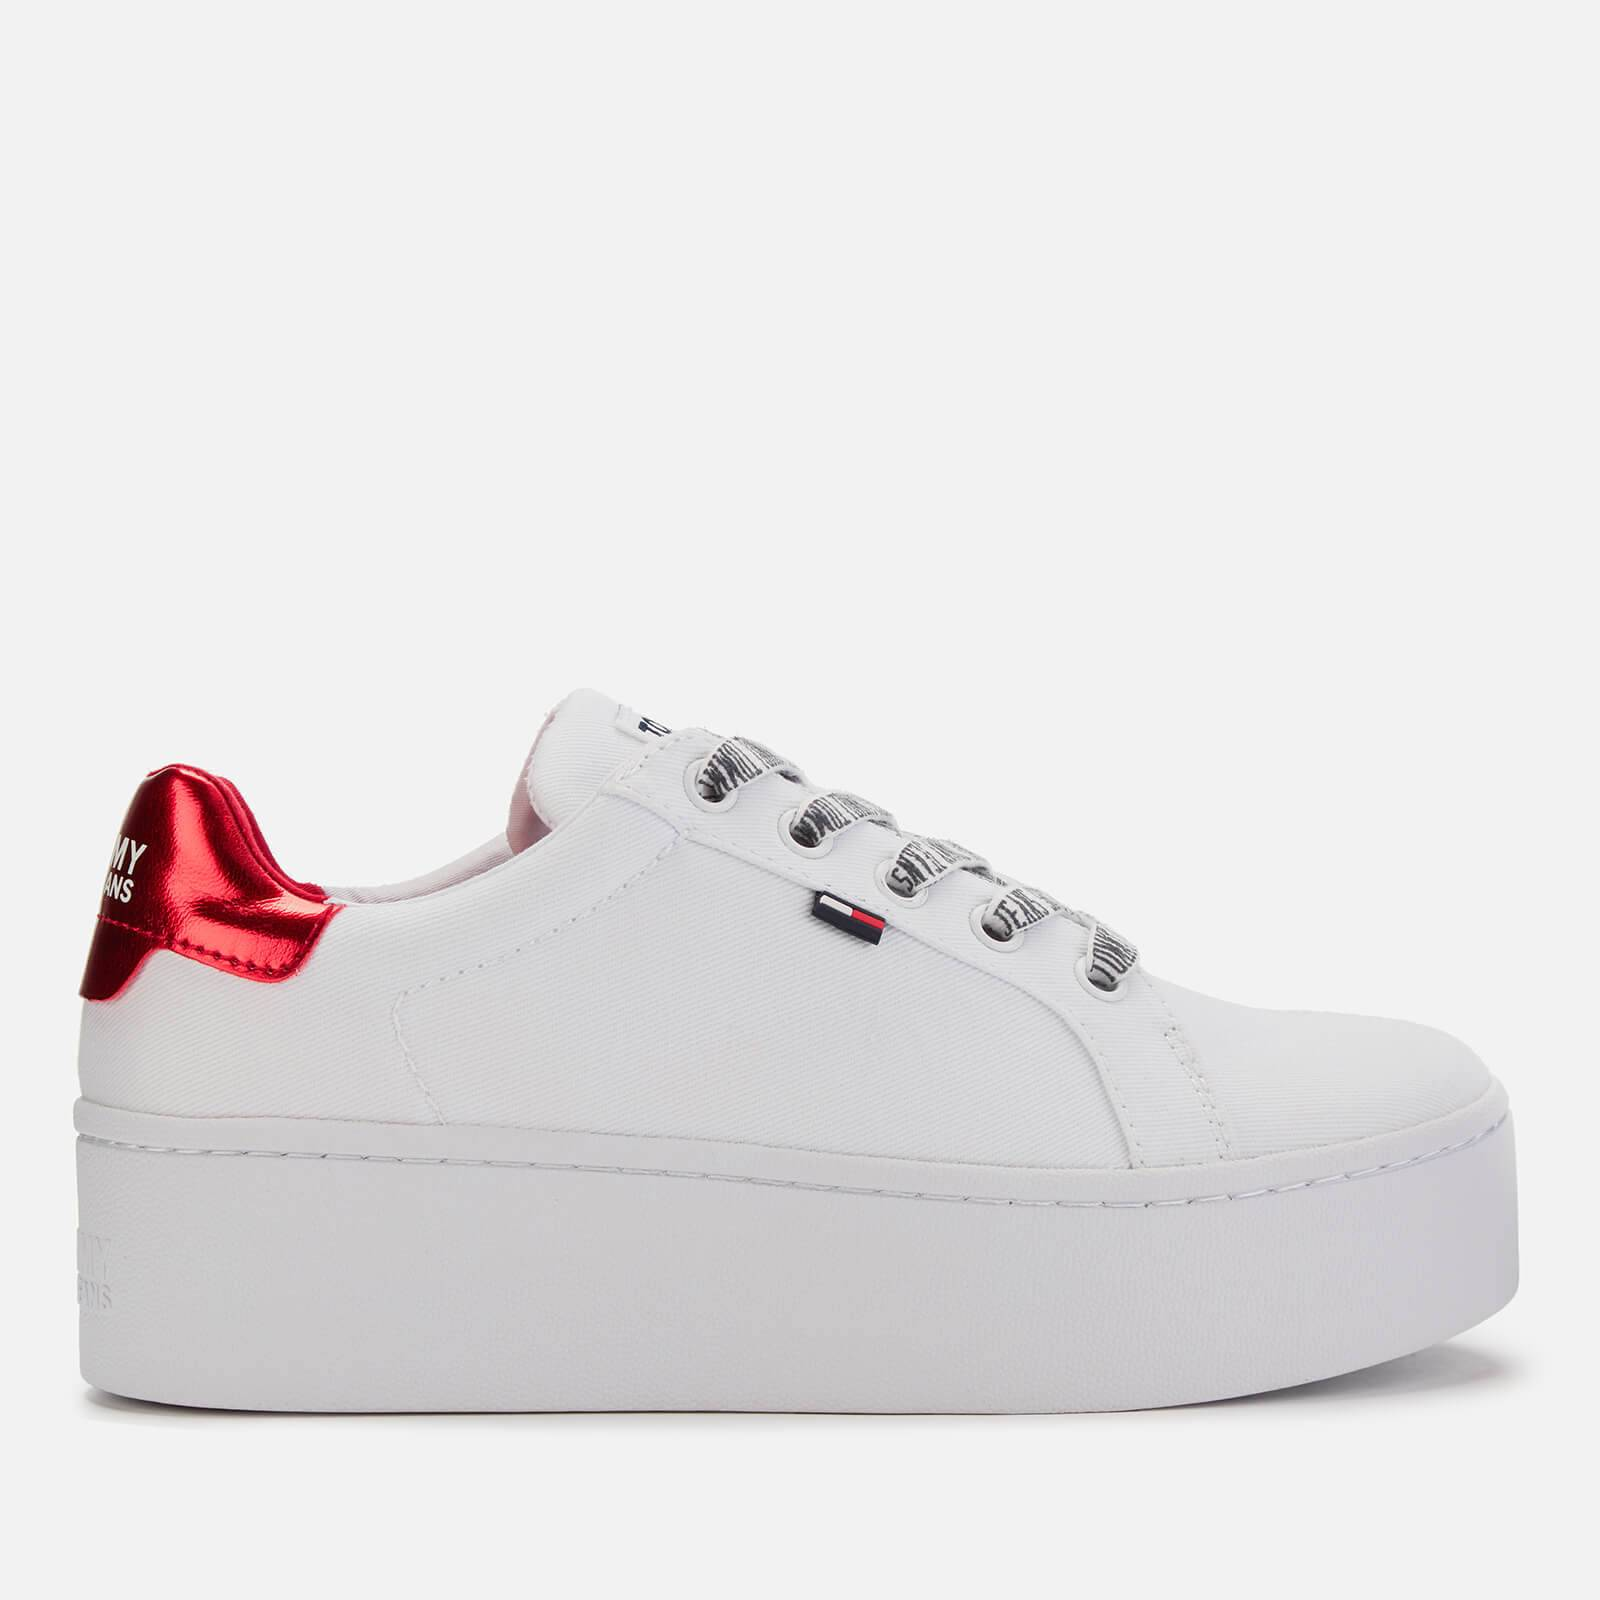 Tommy Jeans Women's Icon Textile Flatform Trainers - White - EU 41/UK 7 - White